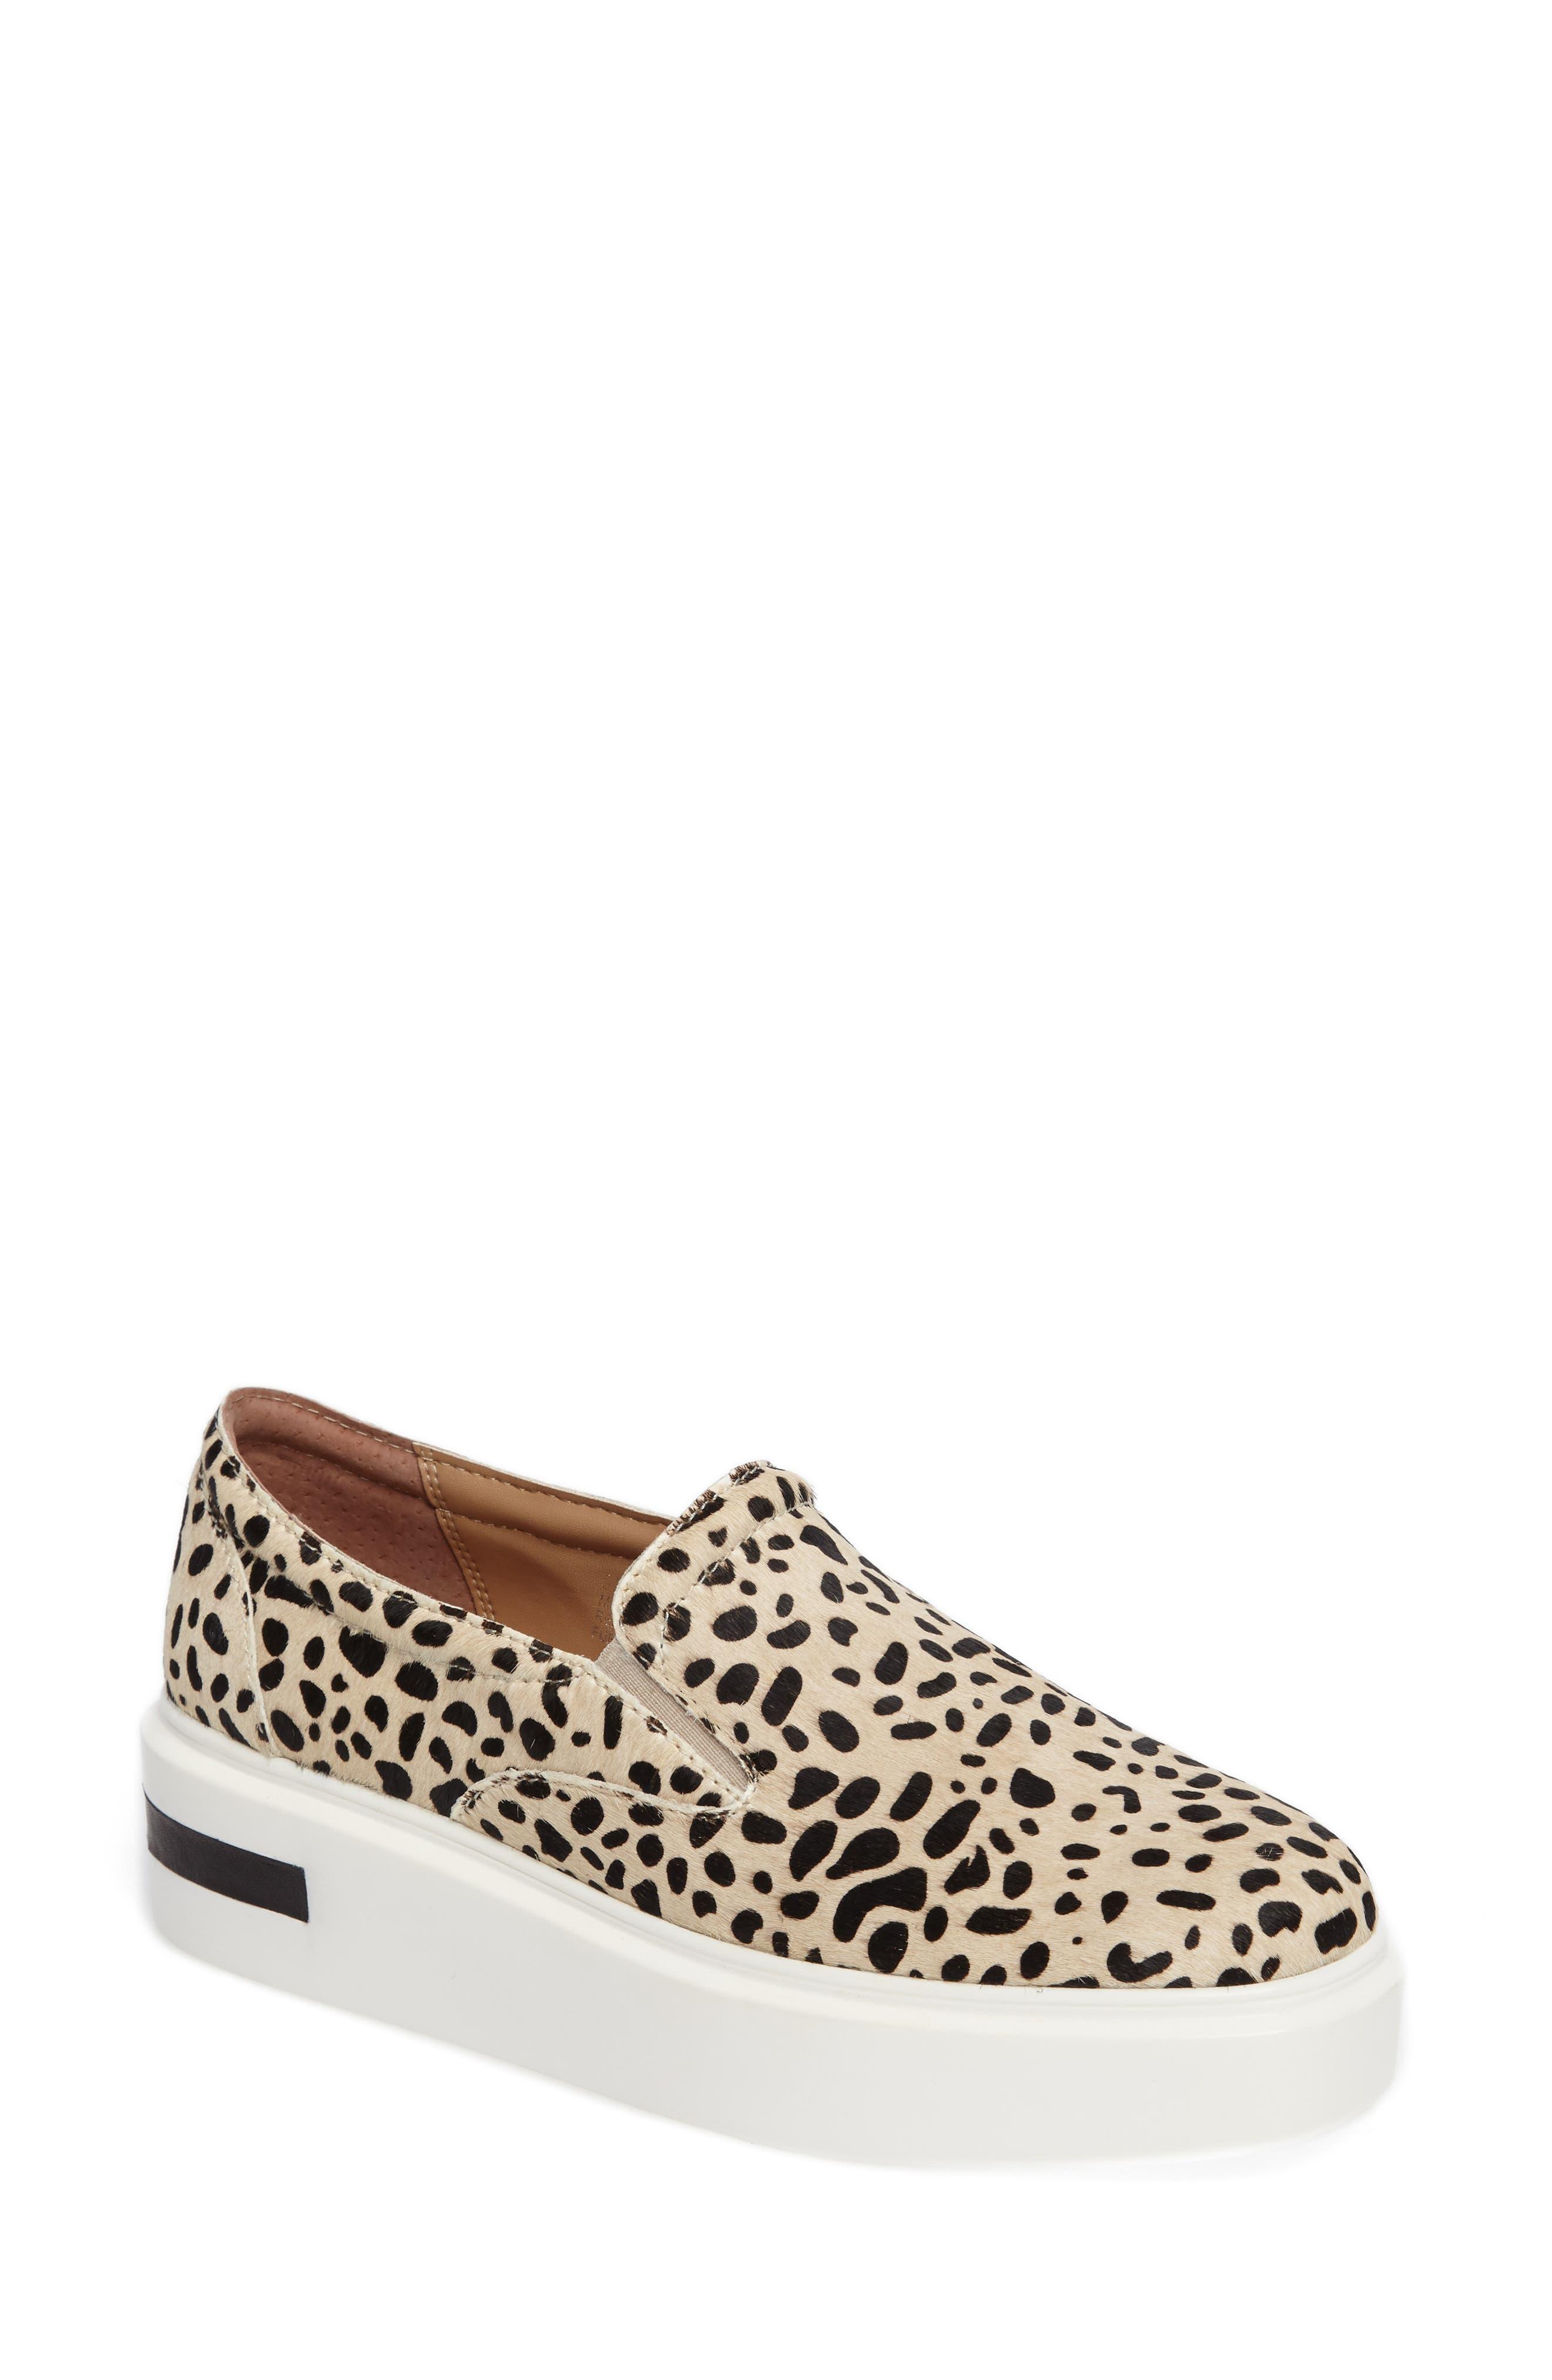 Main Image - Linea Paolo Fairfax II Genuine Calf Hair Platform Sneaker (Women)